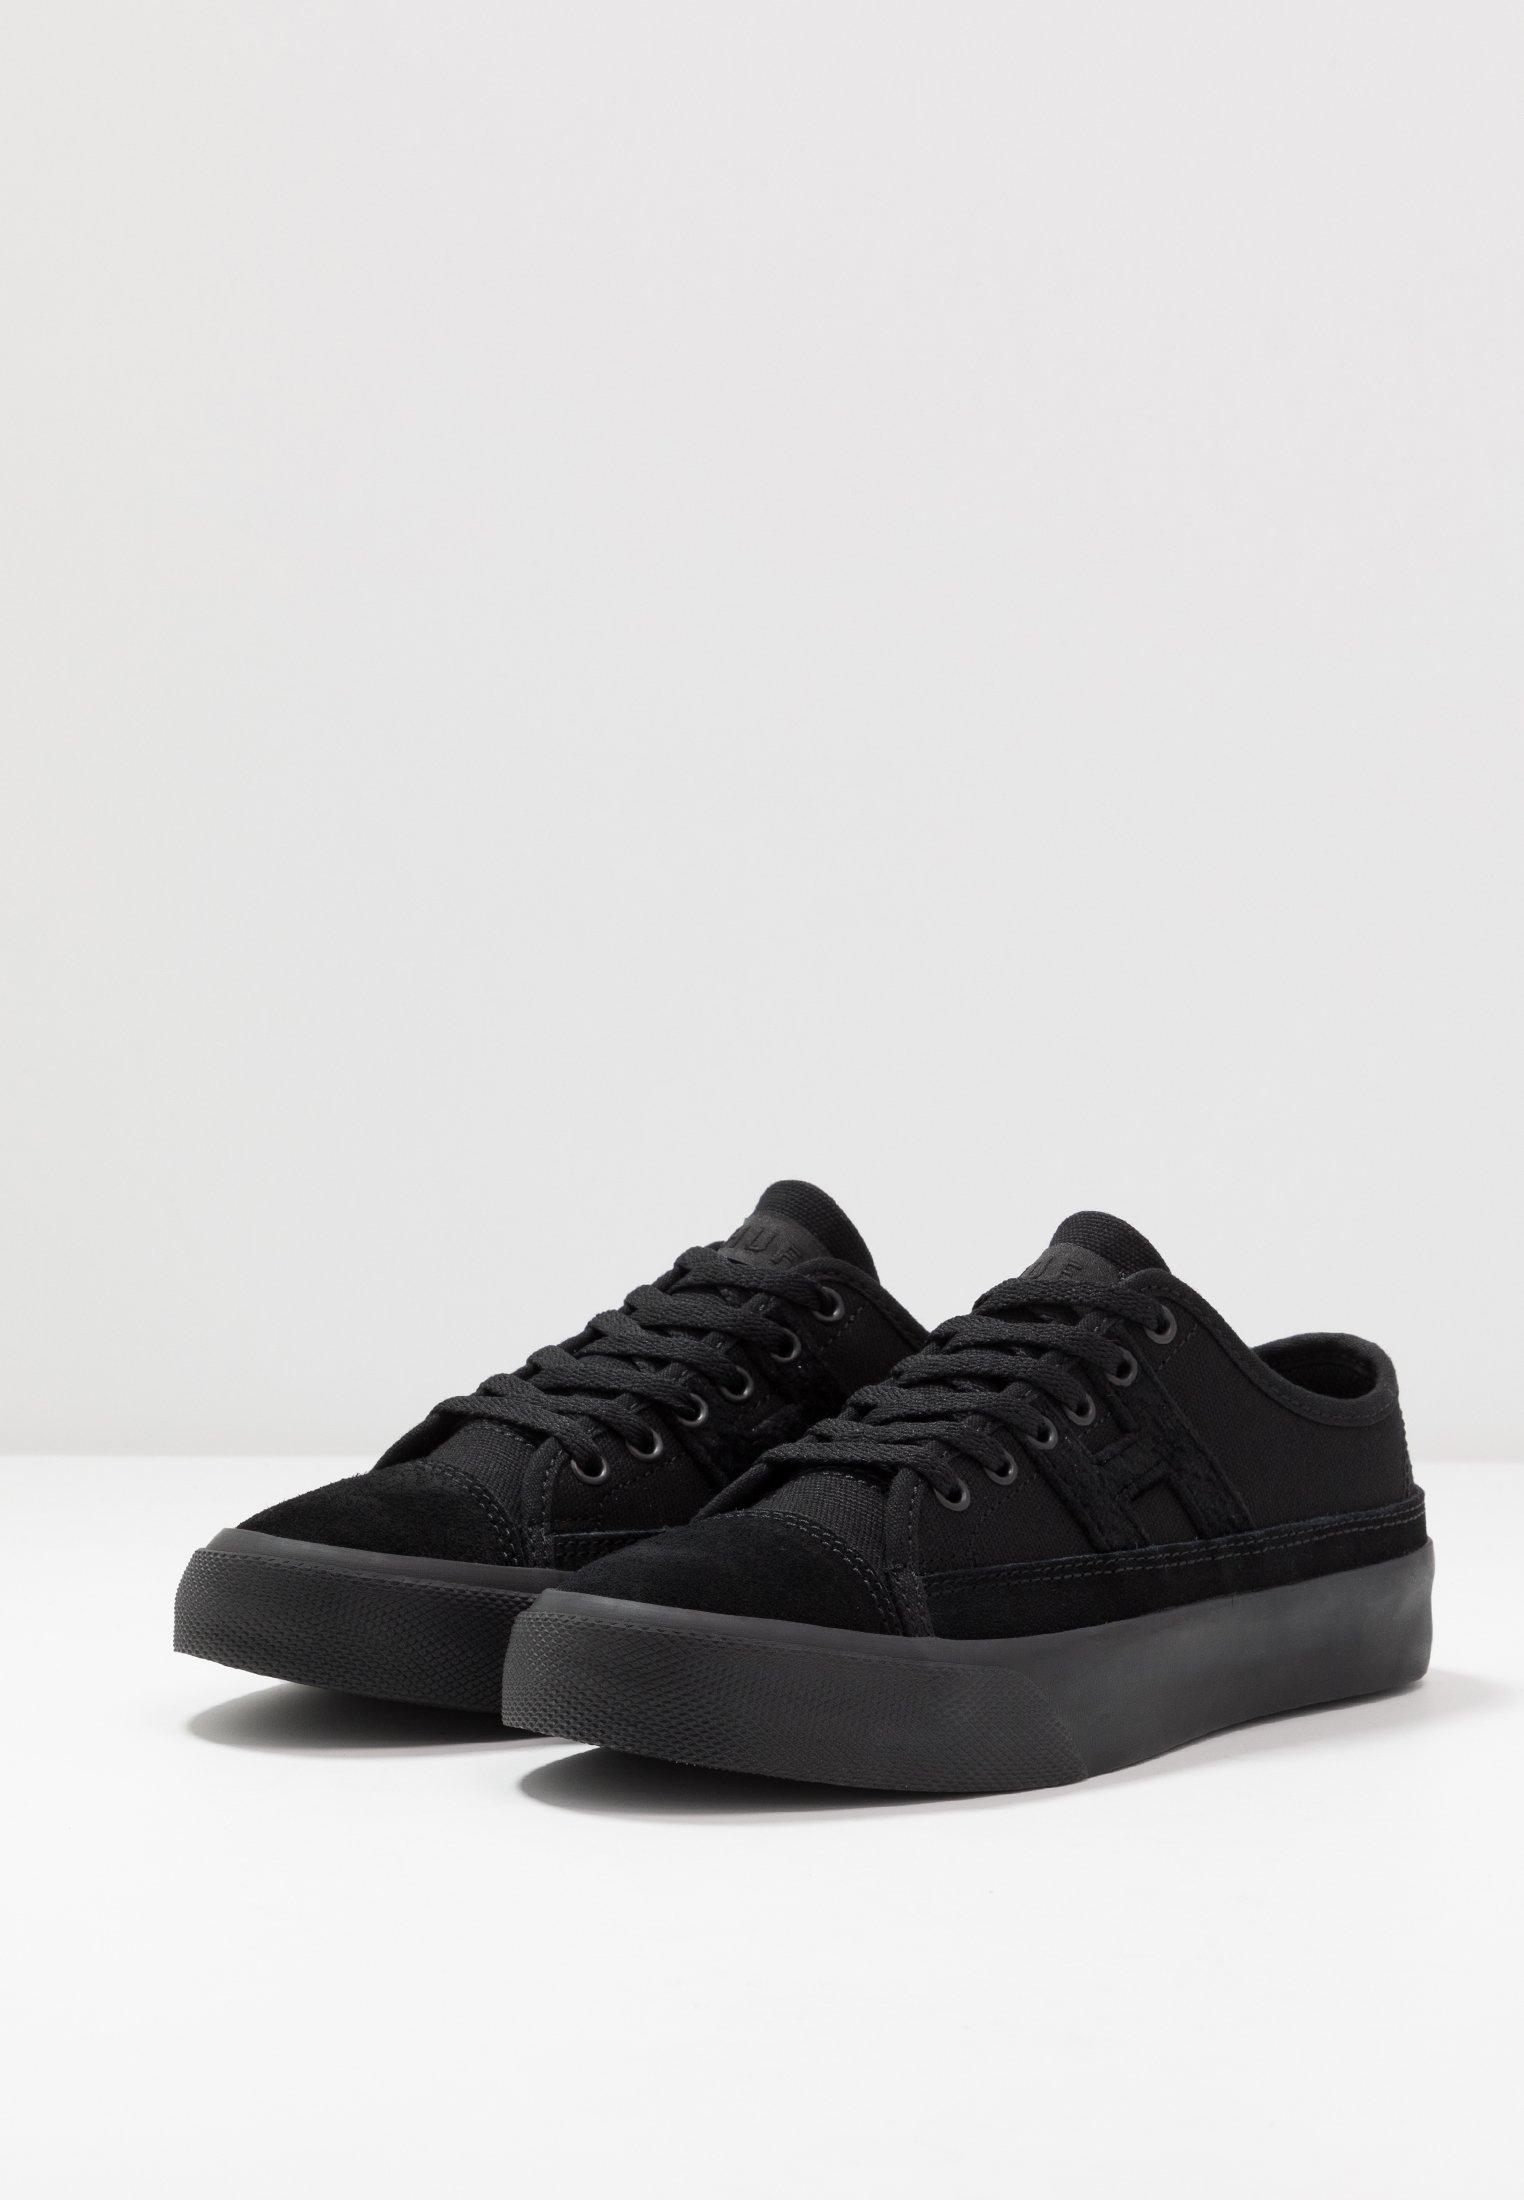 Huf Basse 2Sneakers Black Hupper Huf 0PwkO8nX